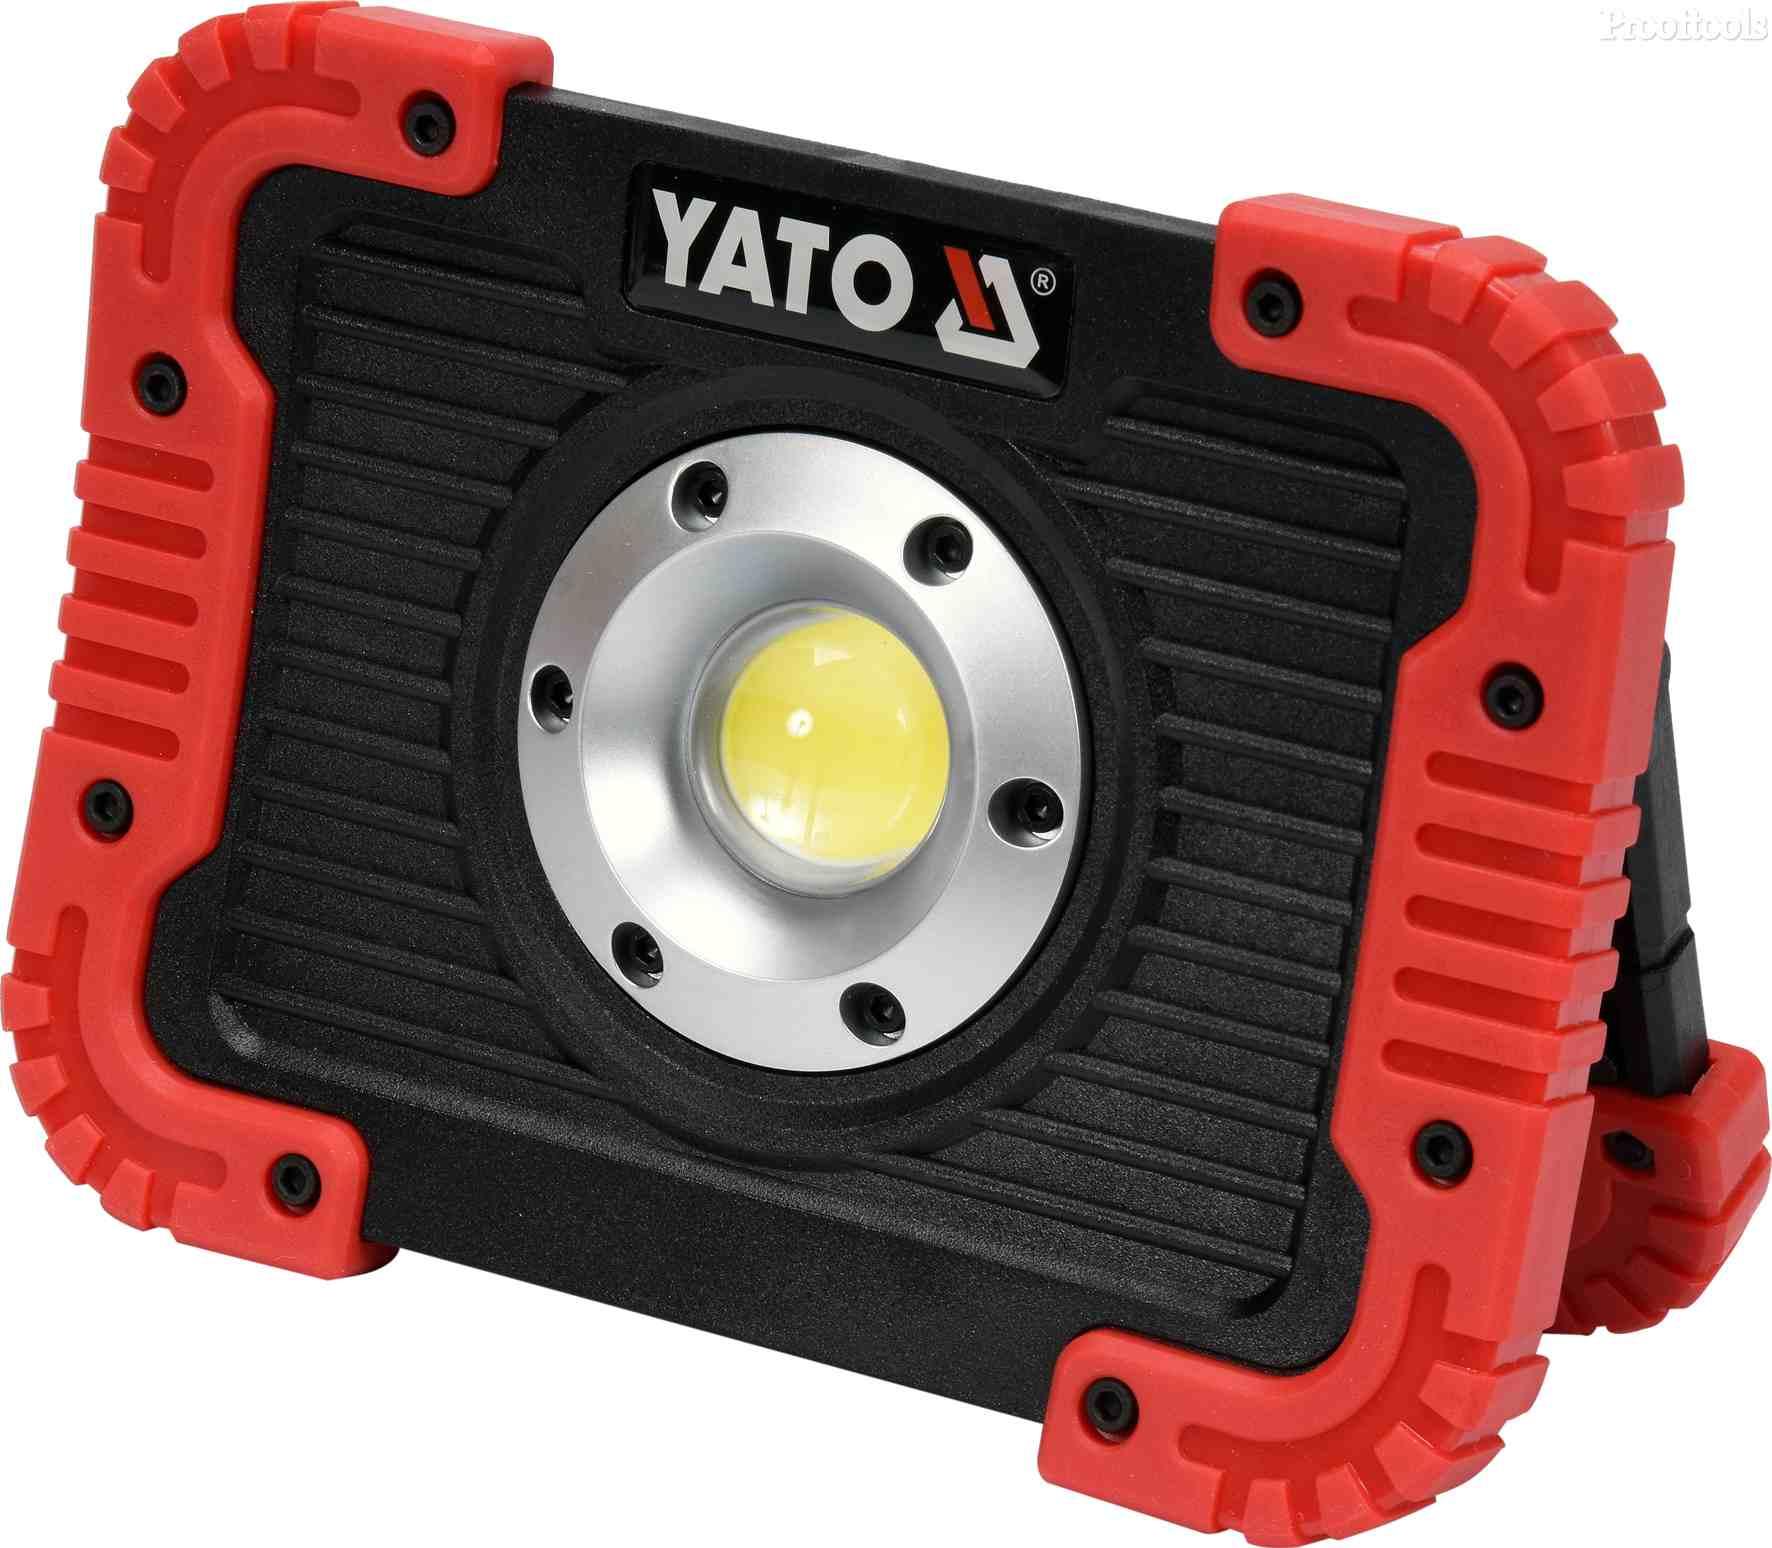 YATO LED LAMPE 10W 800LM OPPLADBAR M USB